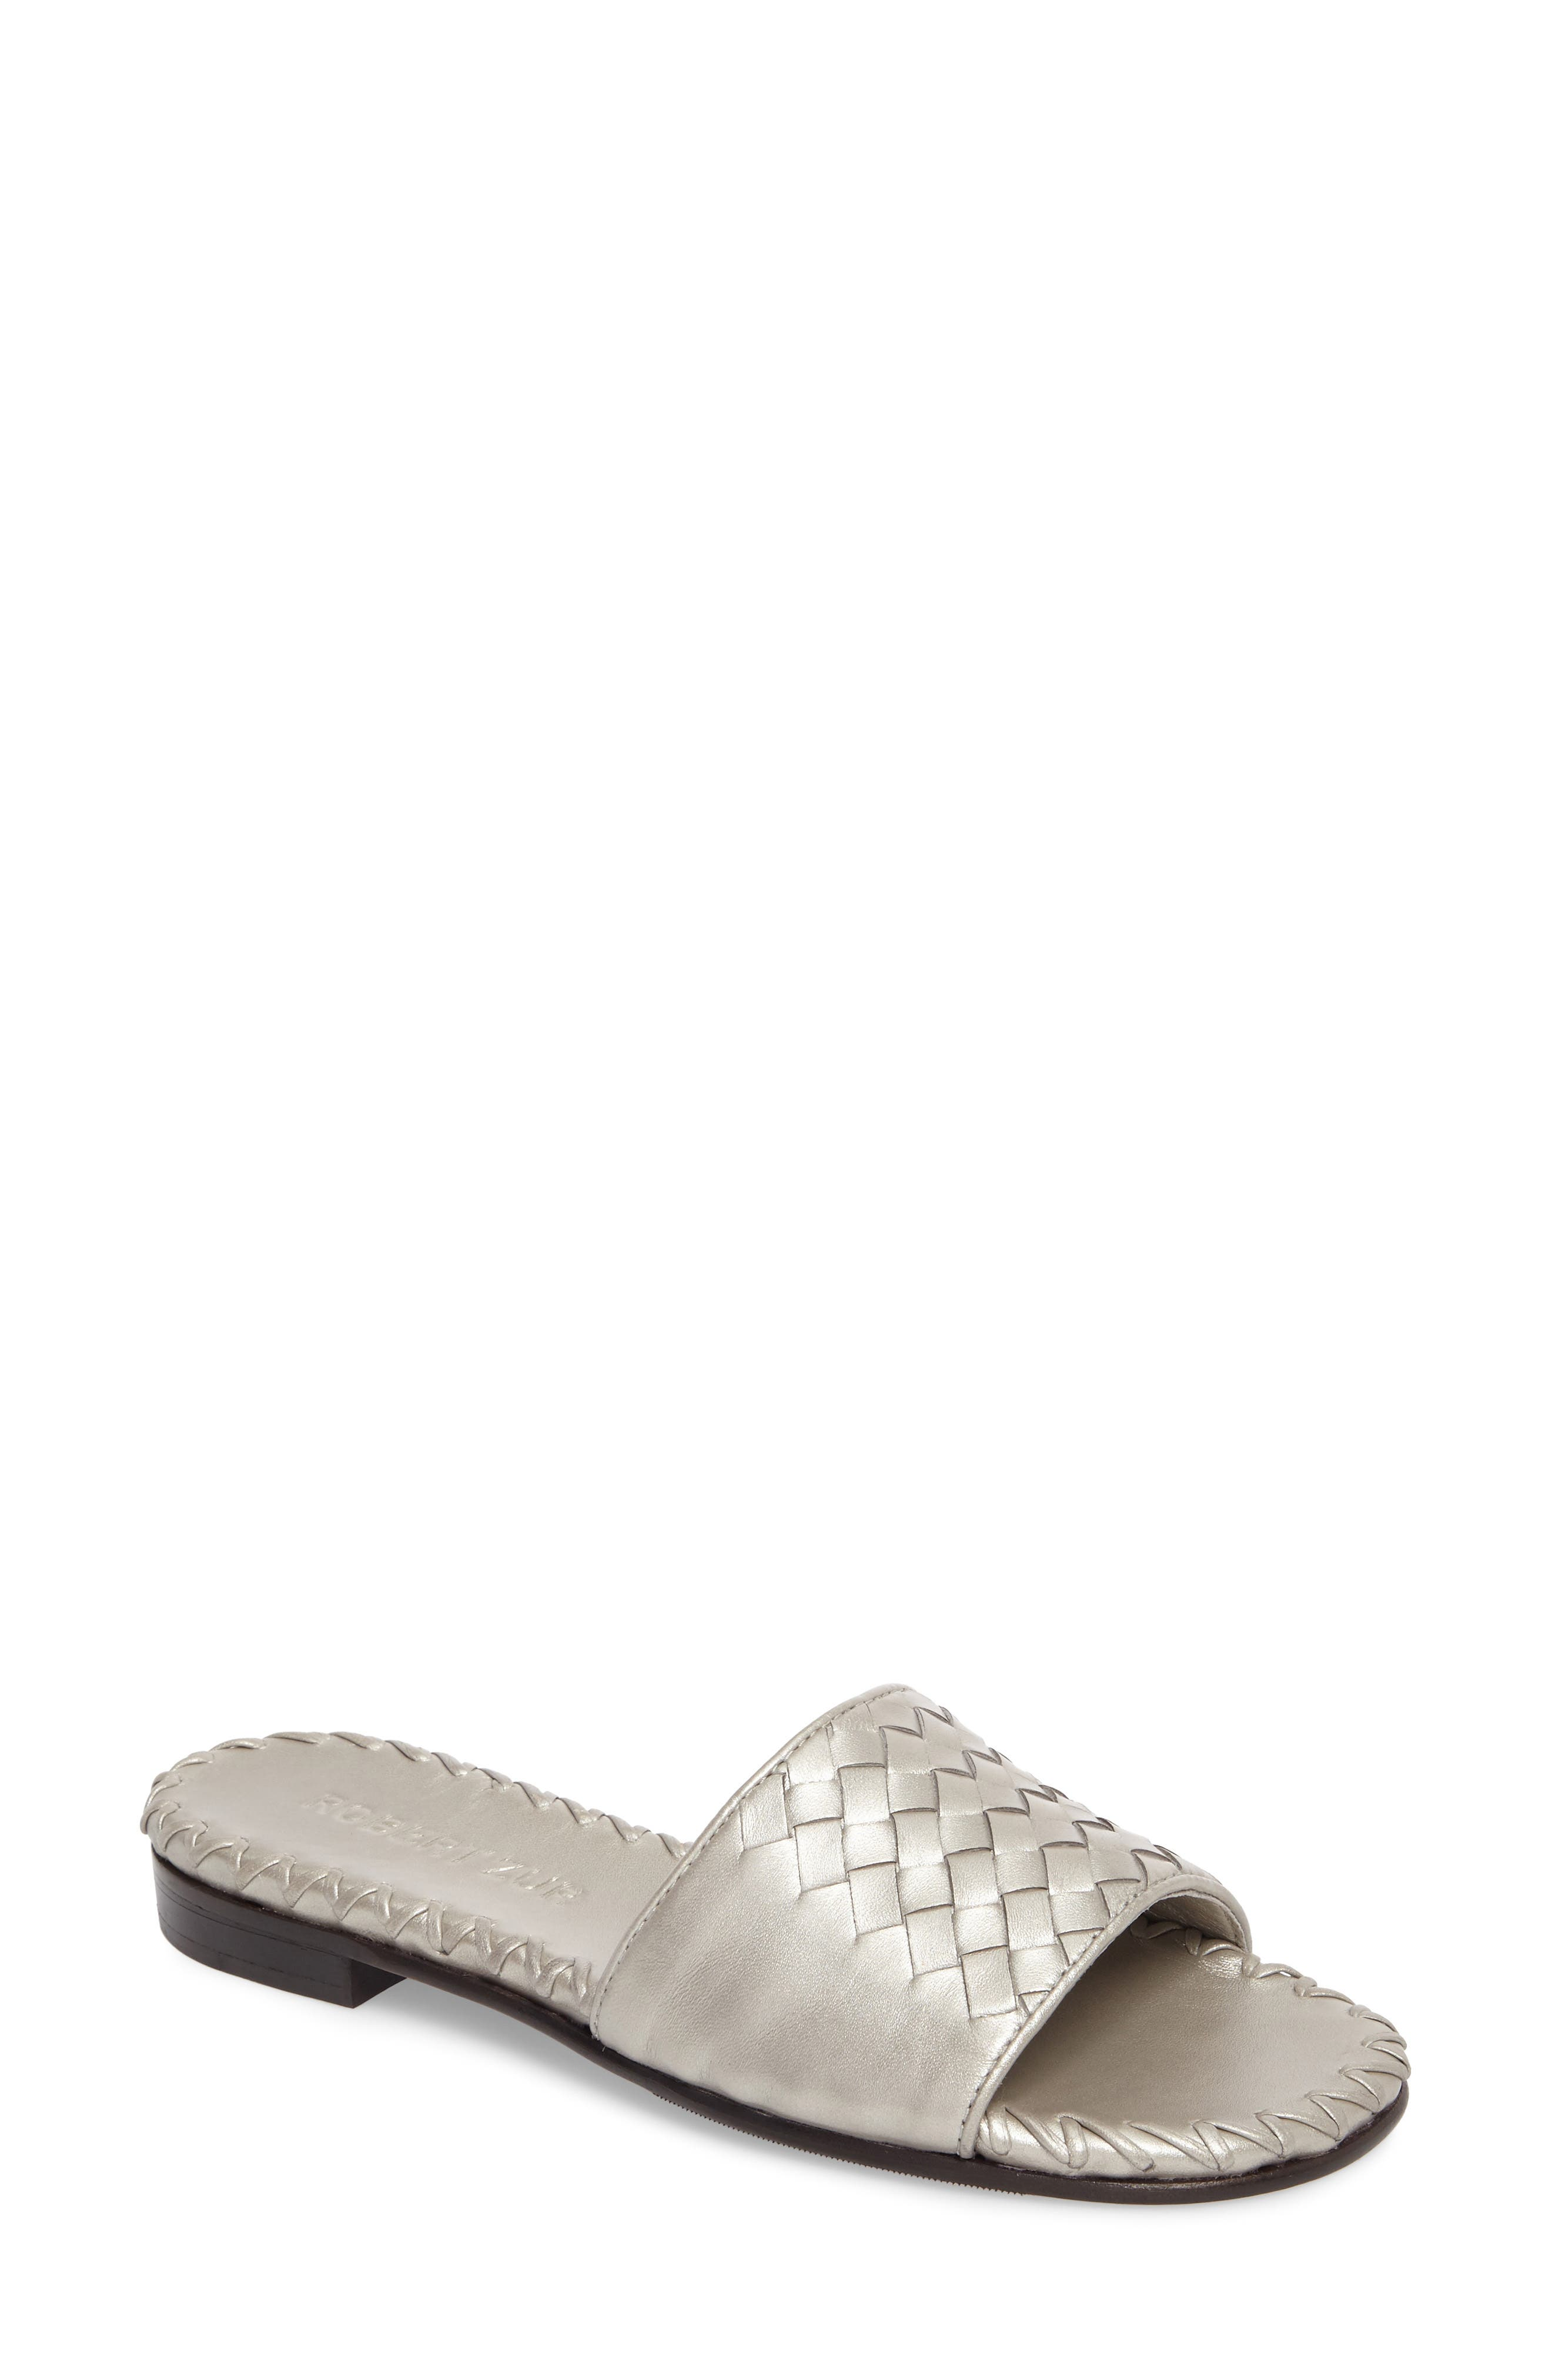 Matilda Woven Slide Sandal,                         Main,                         color, Silver